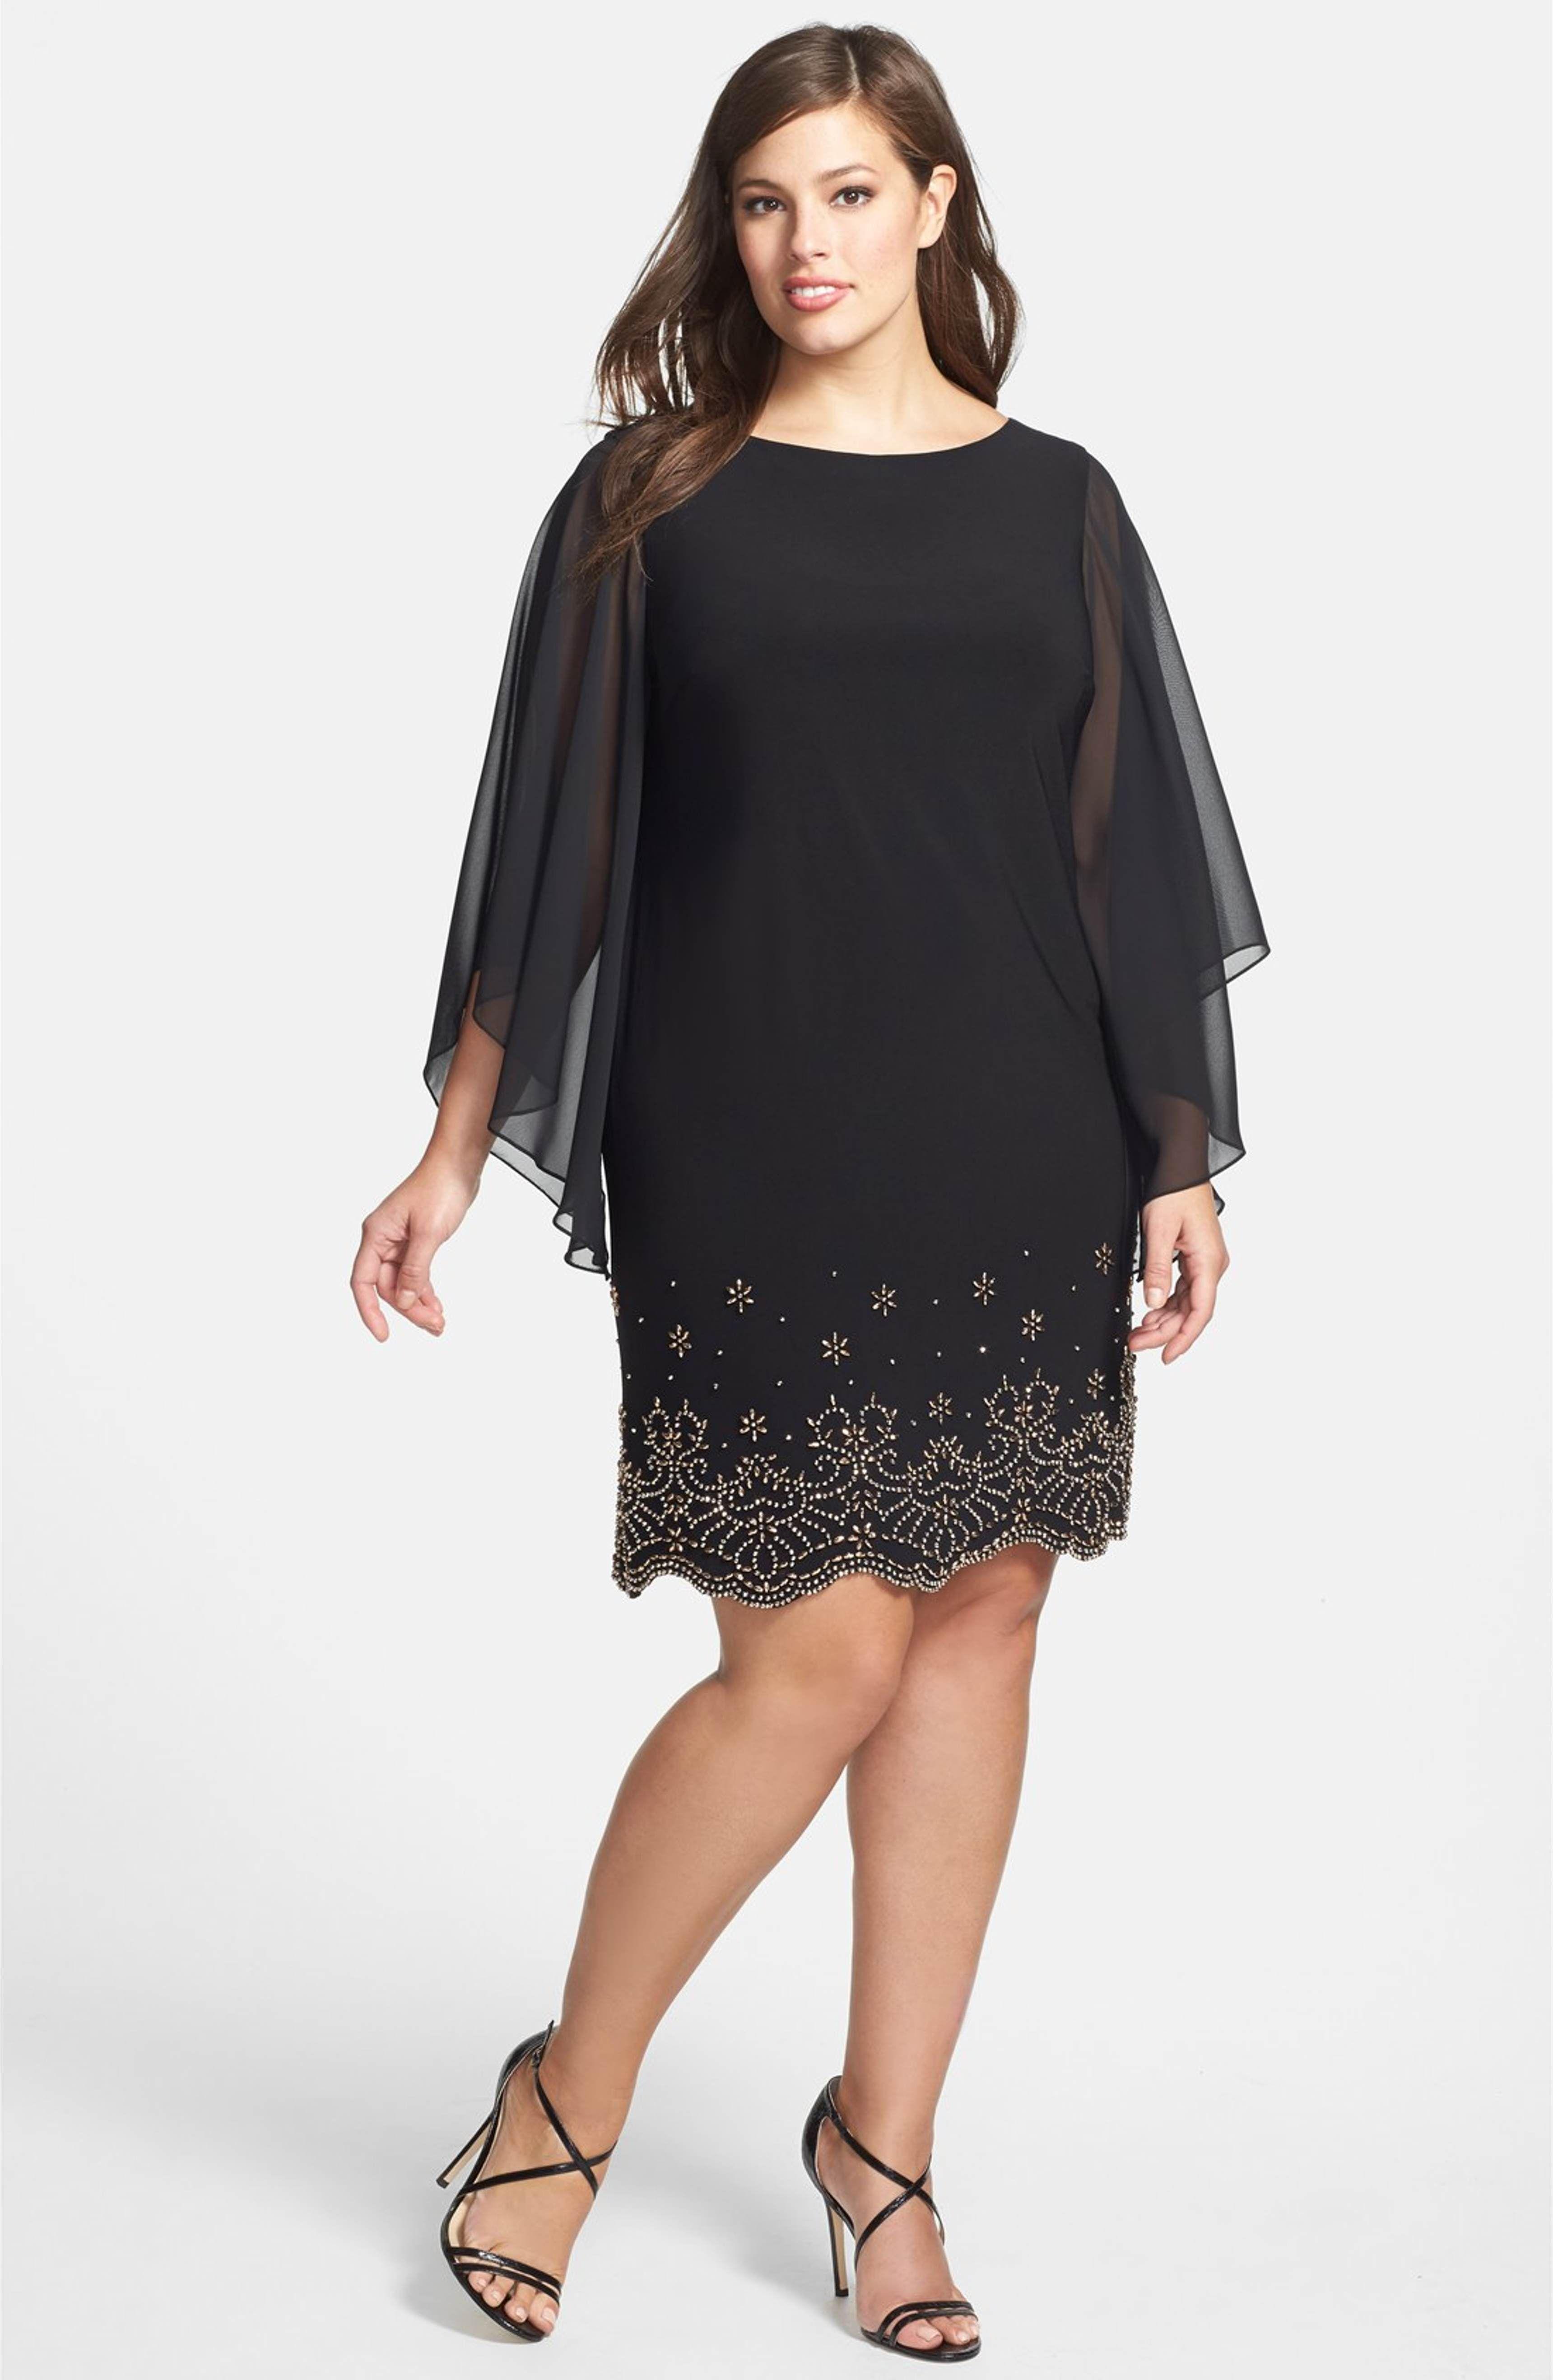 Embellished Chiffon Shift Dress | Nordstrom and Fashion